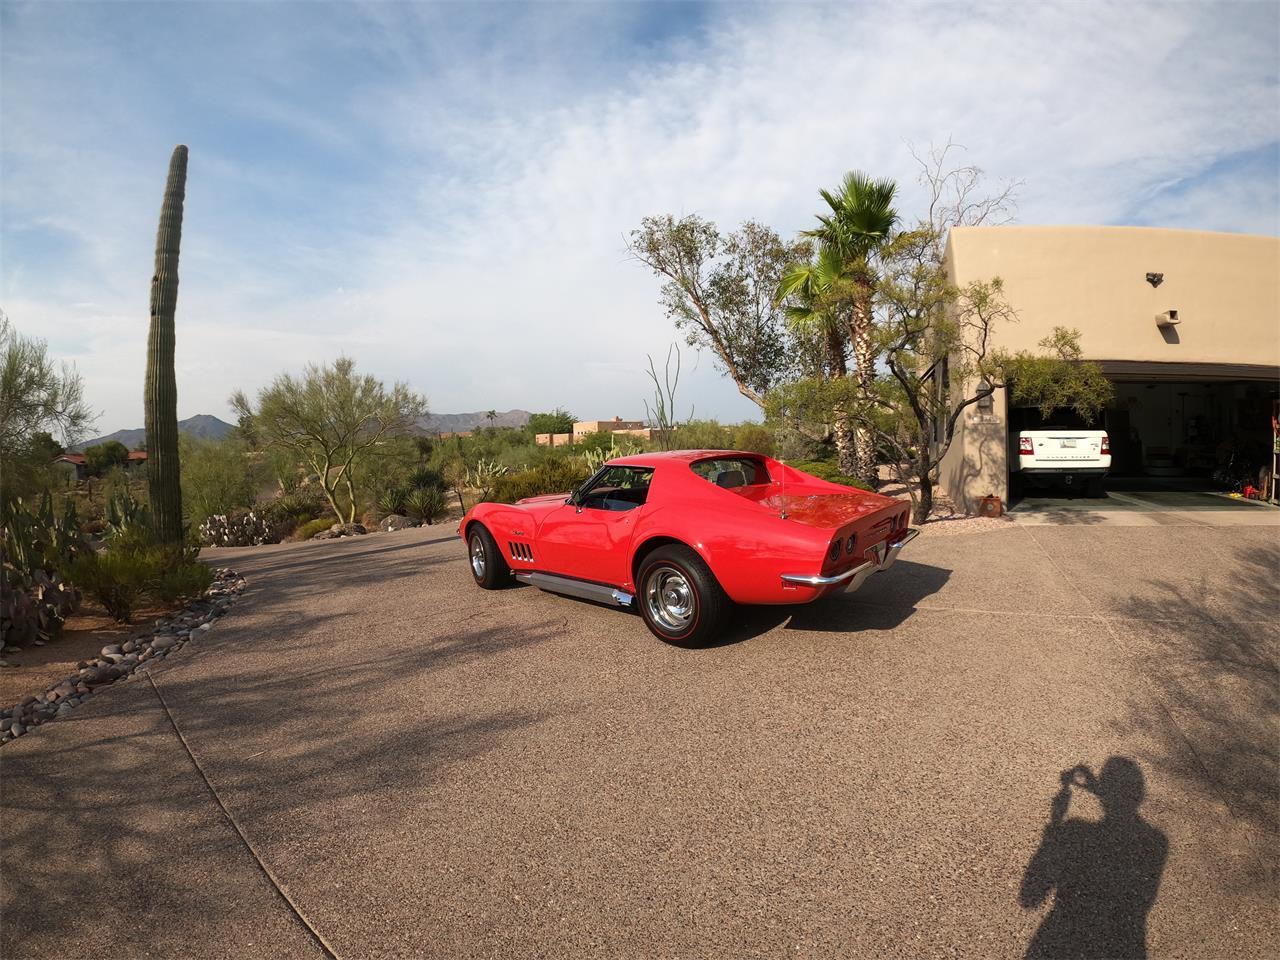 1969 Chevrolet Corvette Stingray (CC-1377841) for sale in Carefree, Arizona